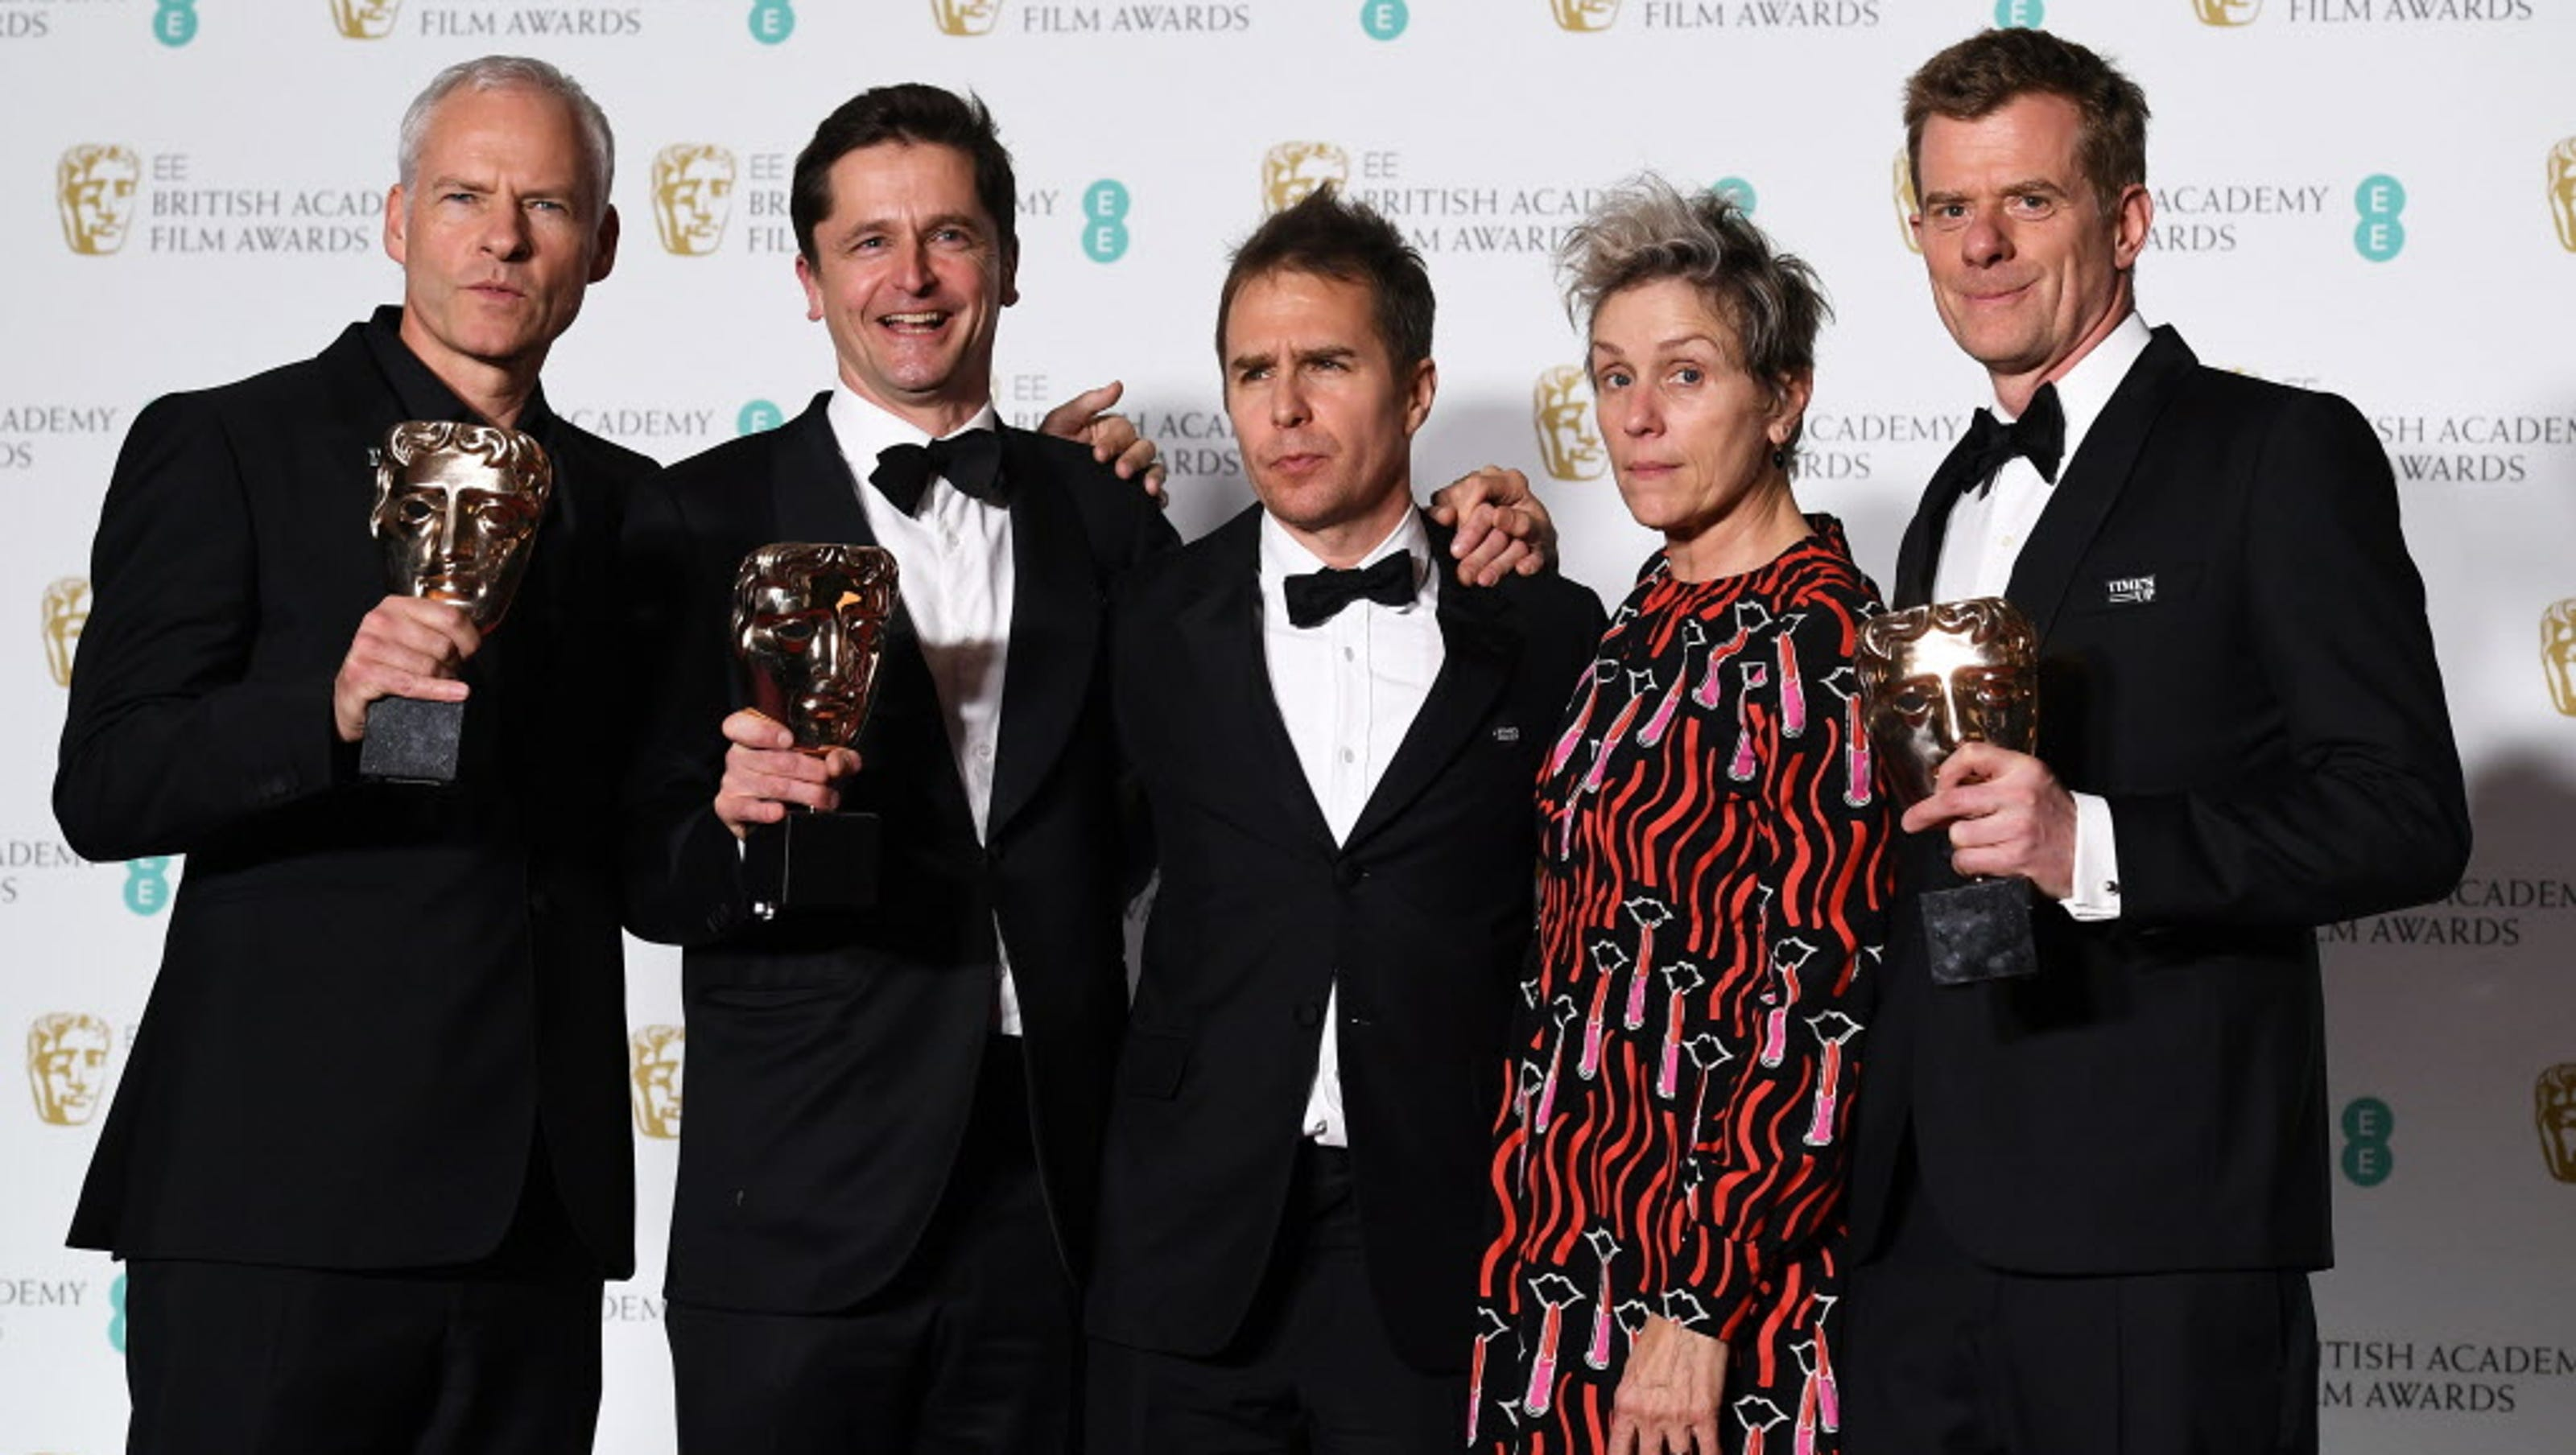 Bafta Awards: BAFTA 2018: 'Three Billboards' Wins, Women Make Waves At U